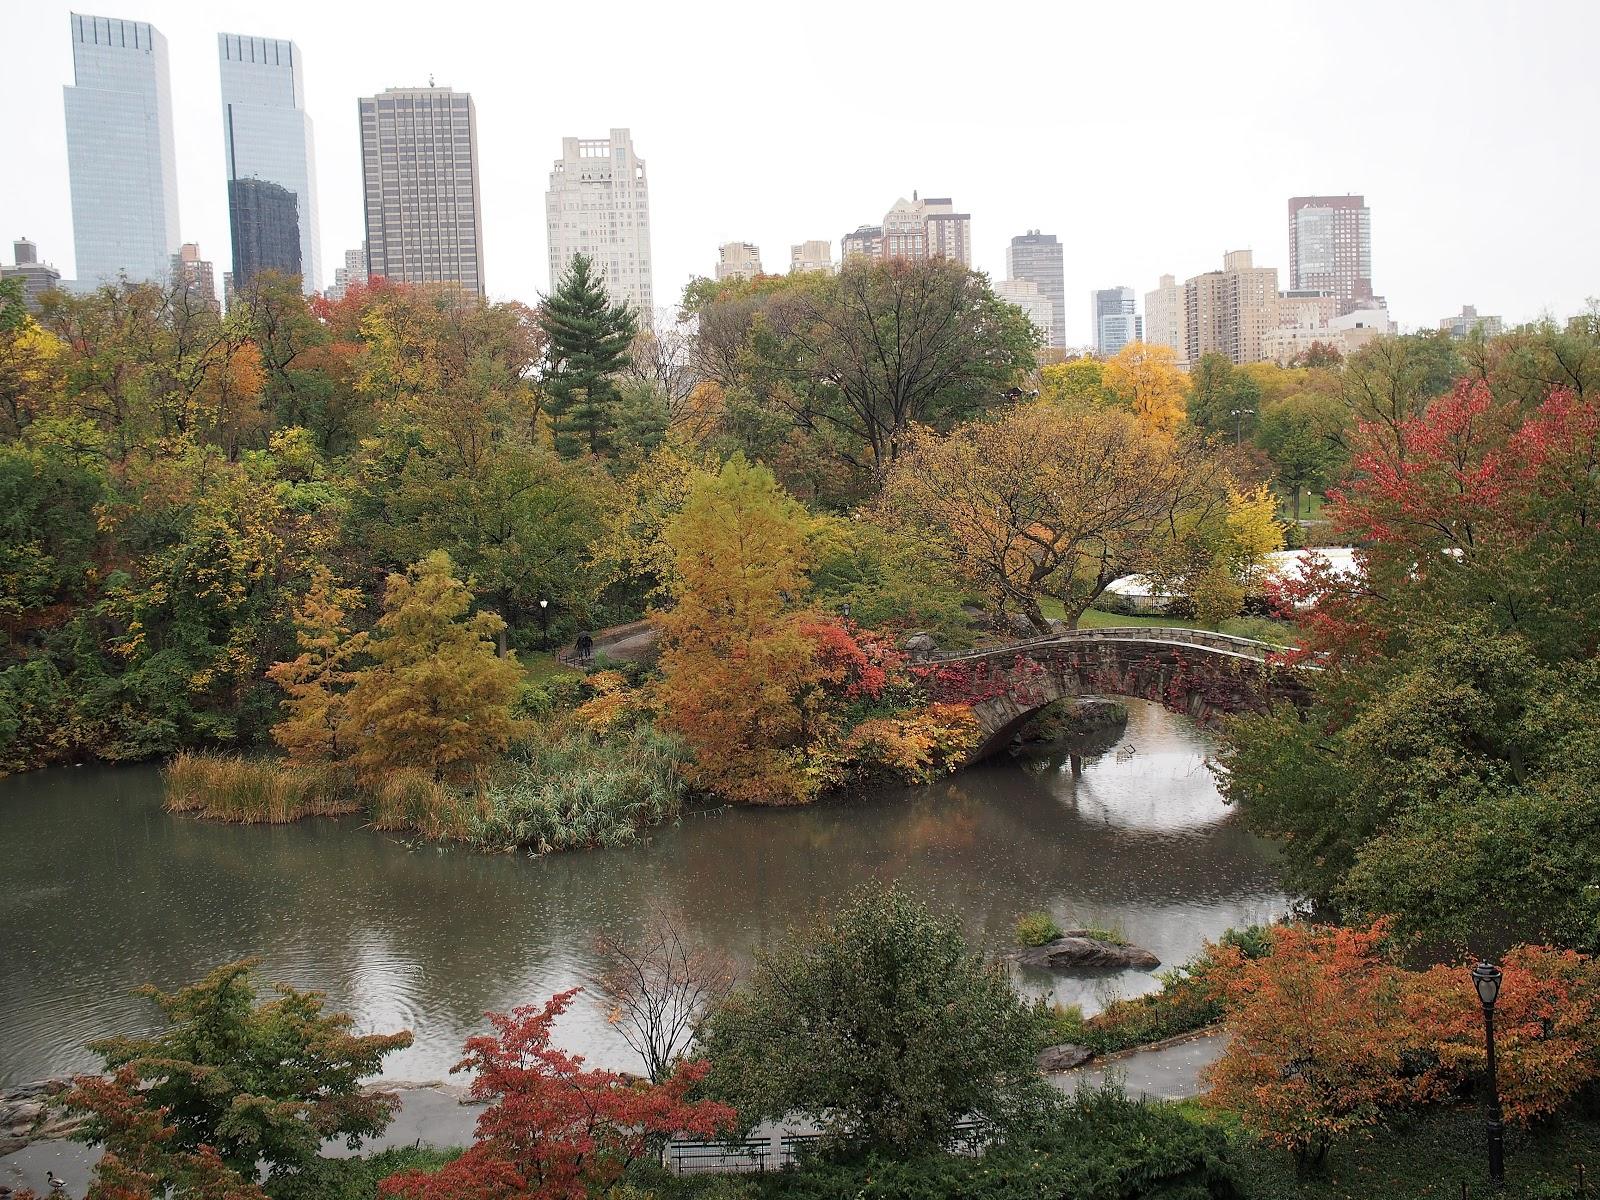 Gapstow Bridge, #GapstowBridge #Gapstow #CentralPark #NYC #2014 #fall #fallfoliage #fallincentralpark